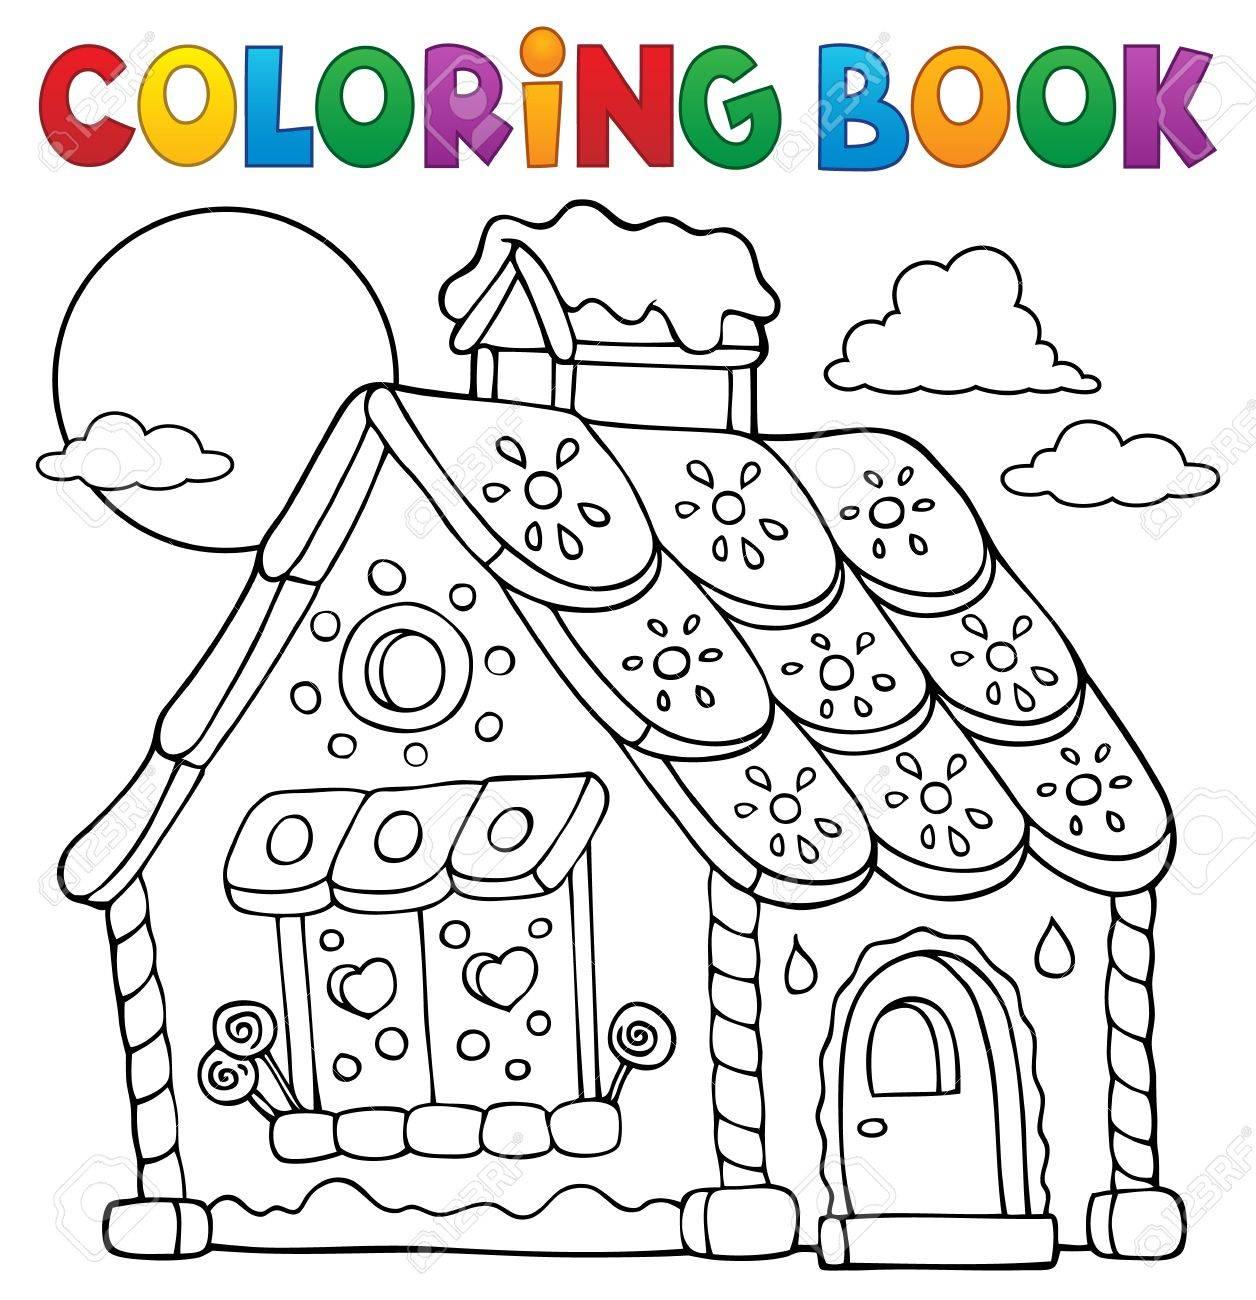 - Coloring Book Gingerbread House Theme 1 - Eps10 Vector